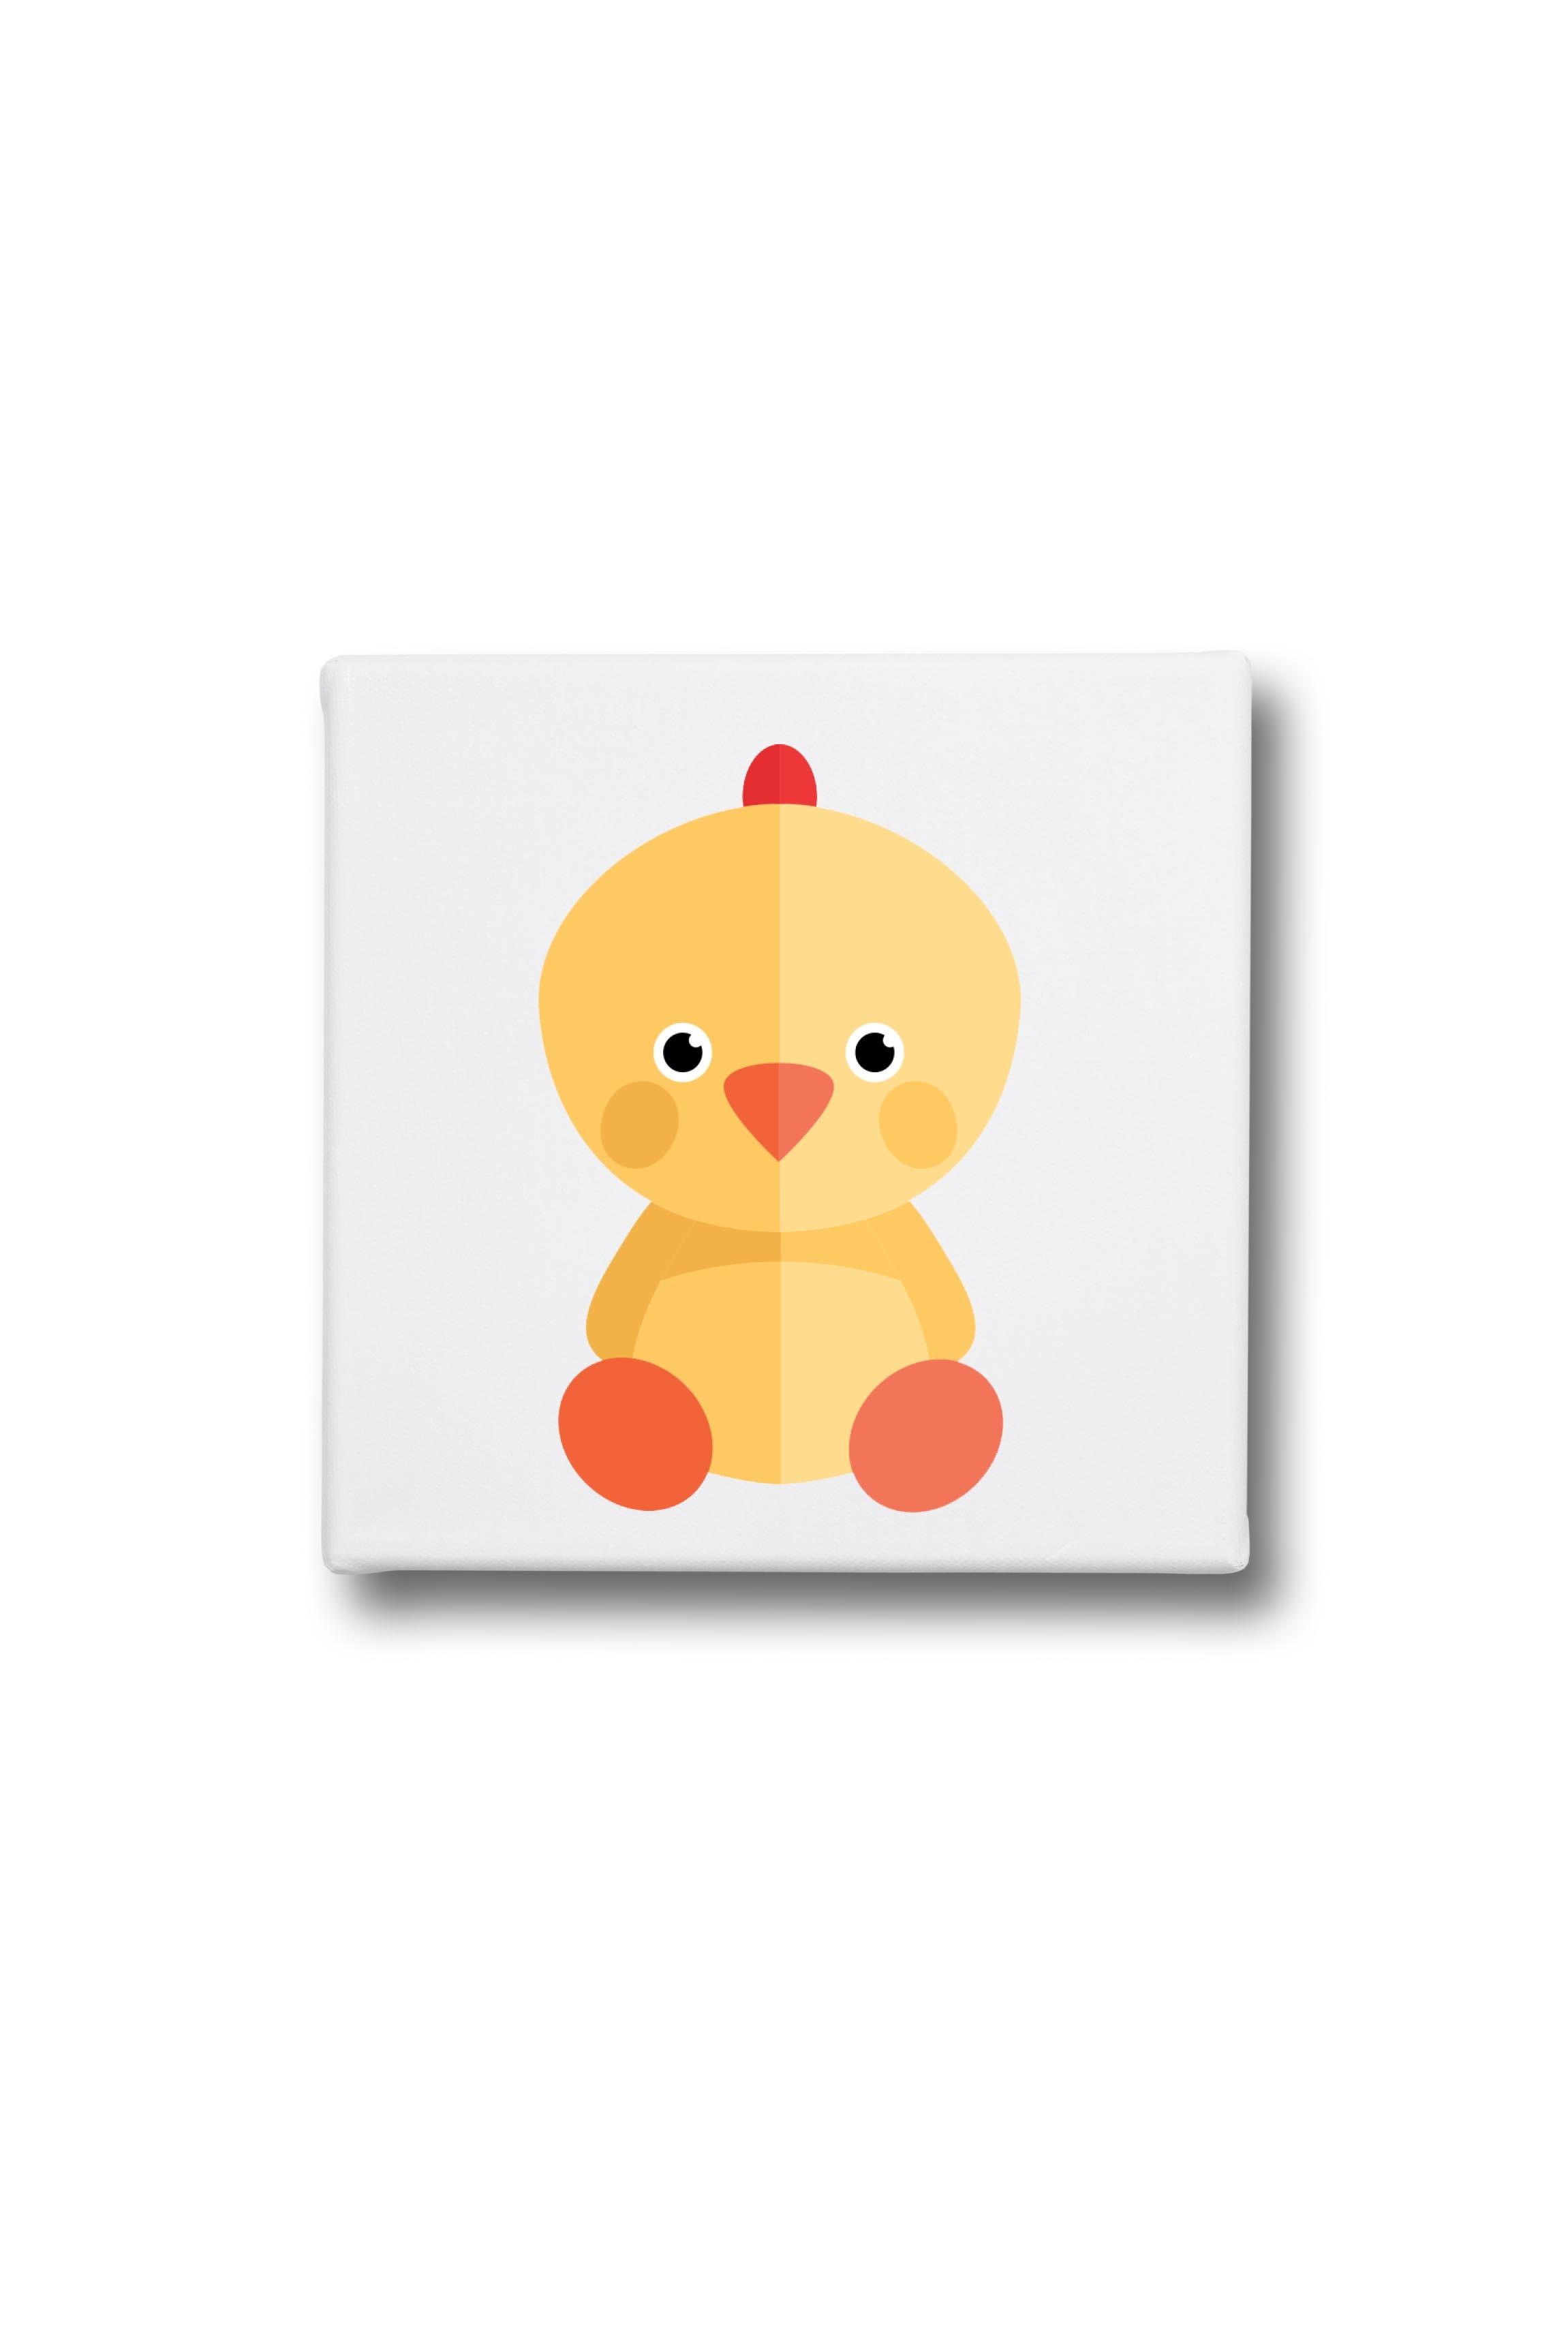 Canvas Chick - Prints for Kids - Wall art prints - Shop